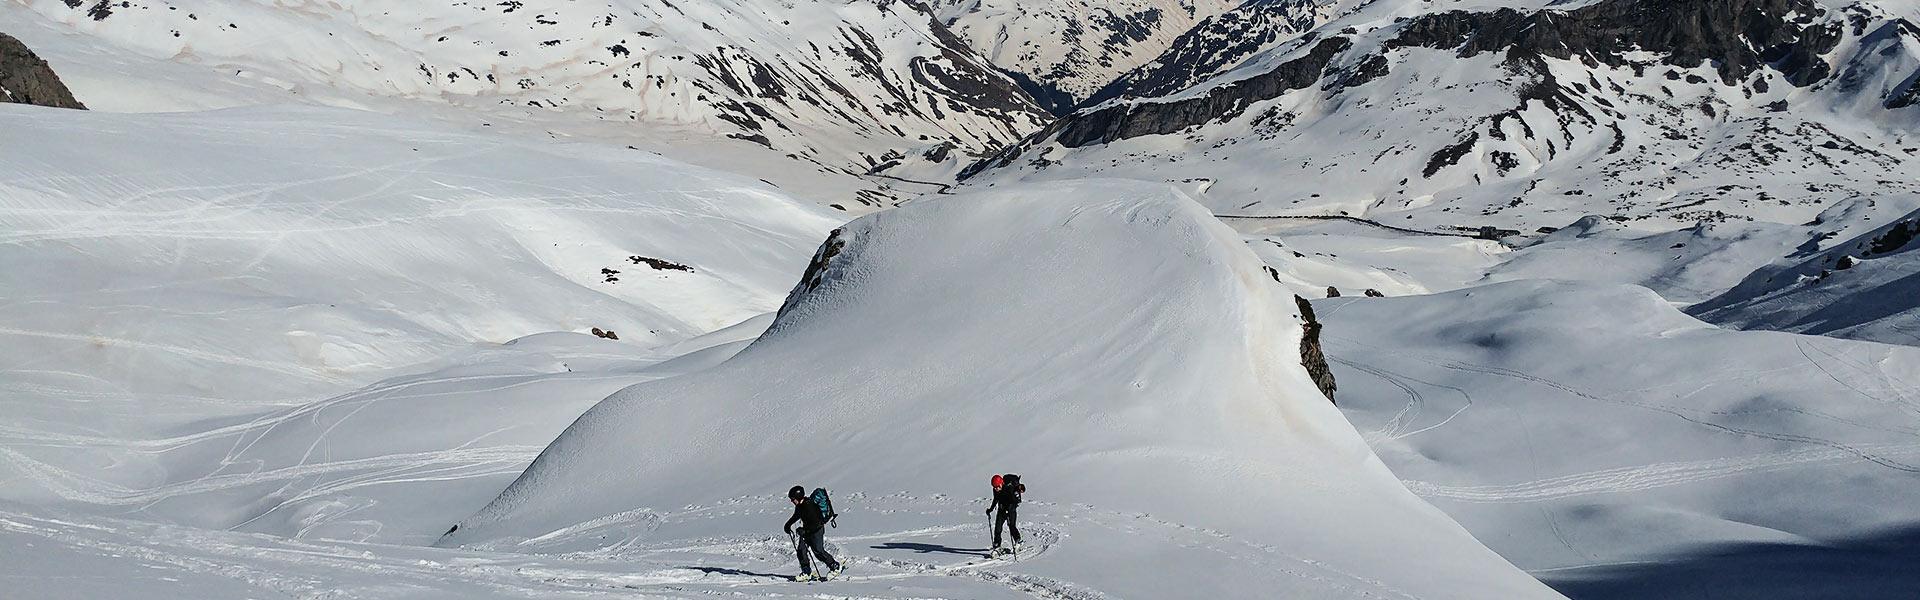 Curso de esquí de travesía